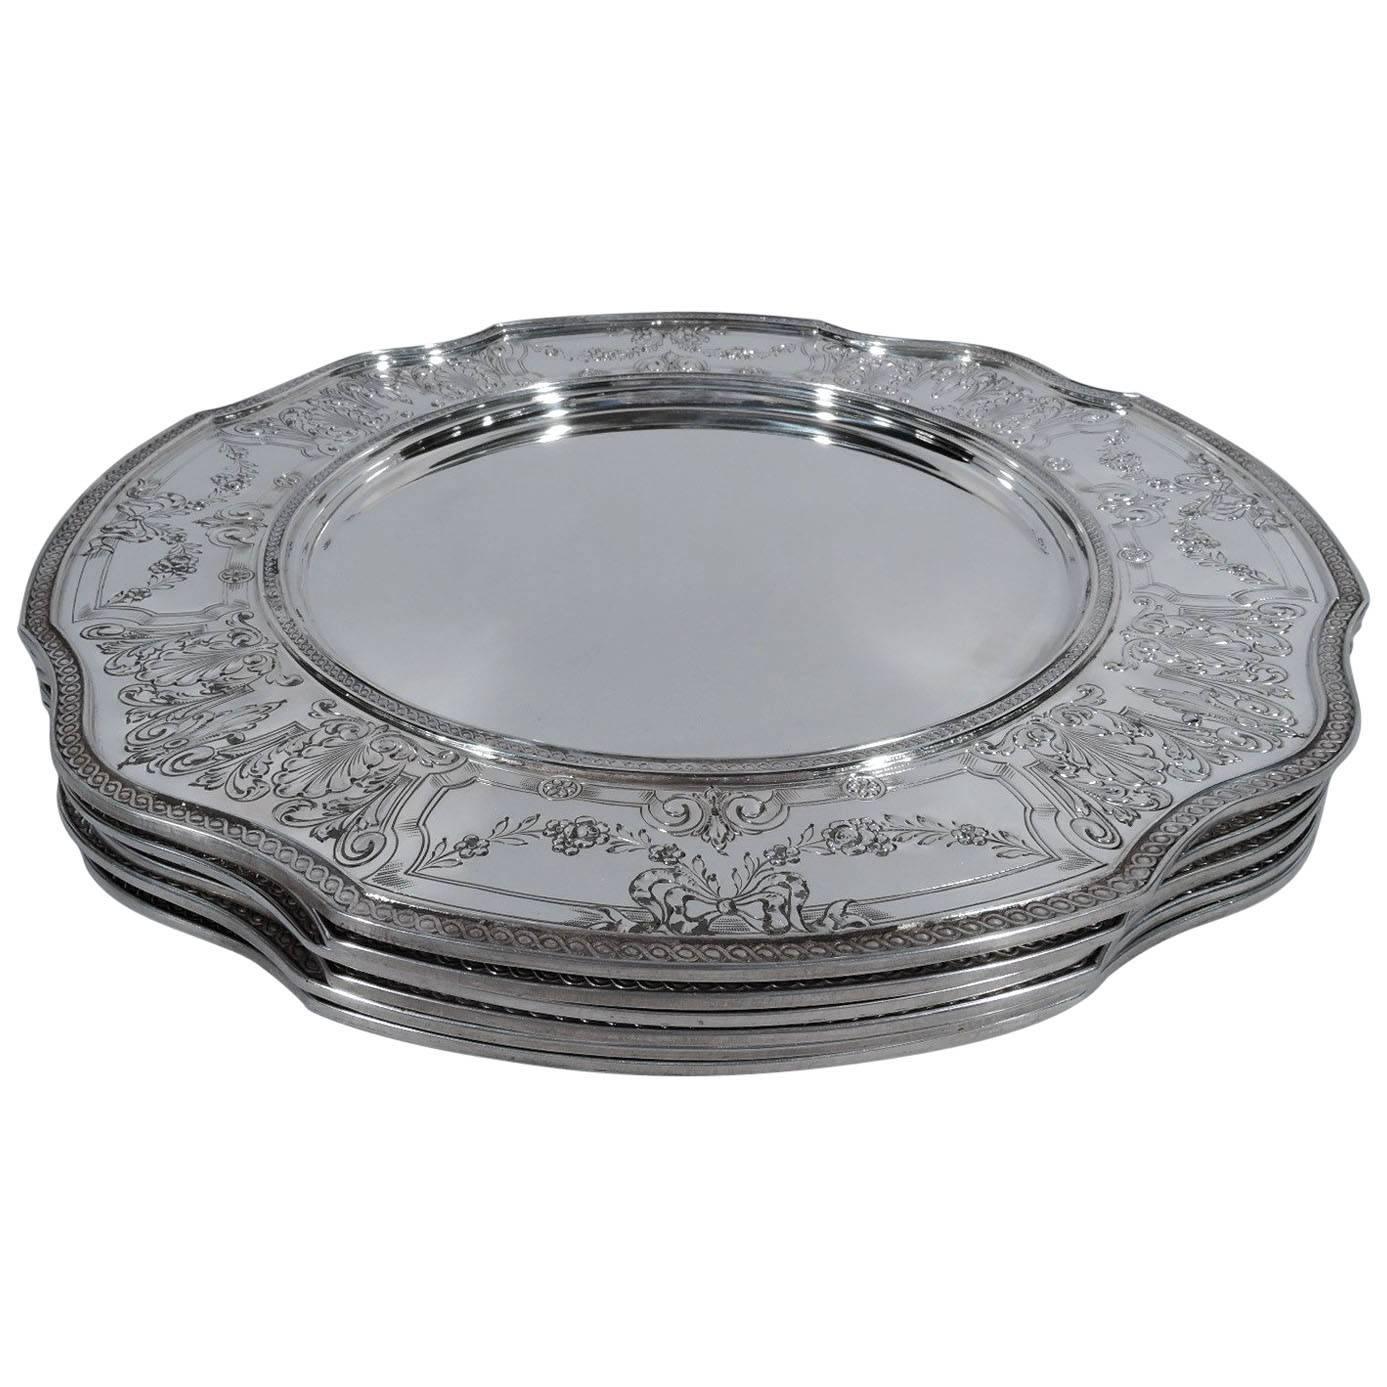 Set of Six Antique American Edwardian Sterling Silver Dinner Plates For Sale  sc 1 st  1stDibs & Set of Six Antique American Edwardian Sterling Silver Dinner Plates ...